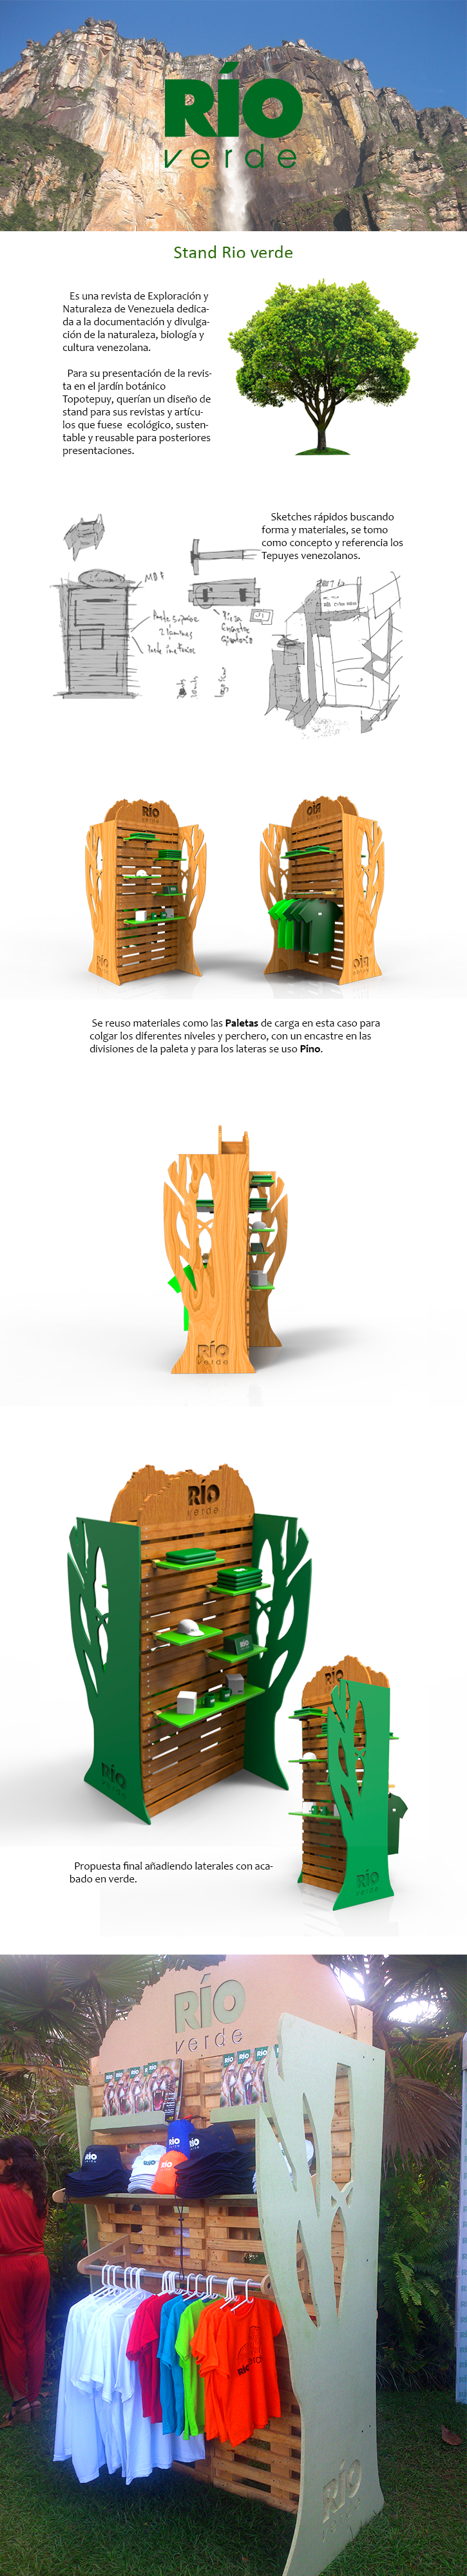 Stand Display pop desing diseño proyecto proyect publicidad revista magazine green Verde Tree  arbol venezuela